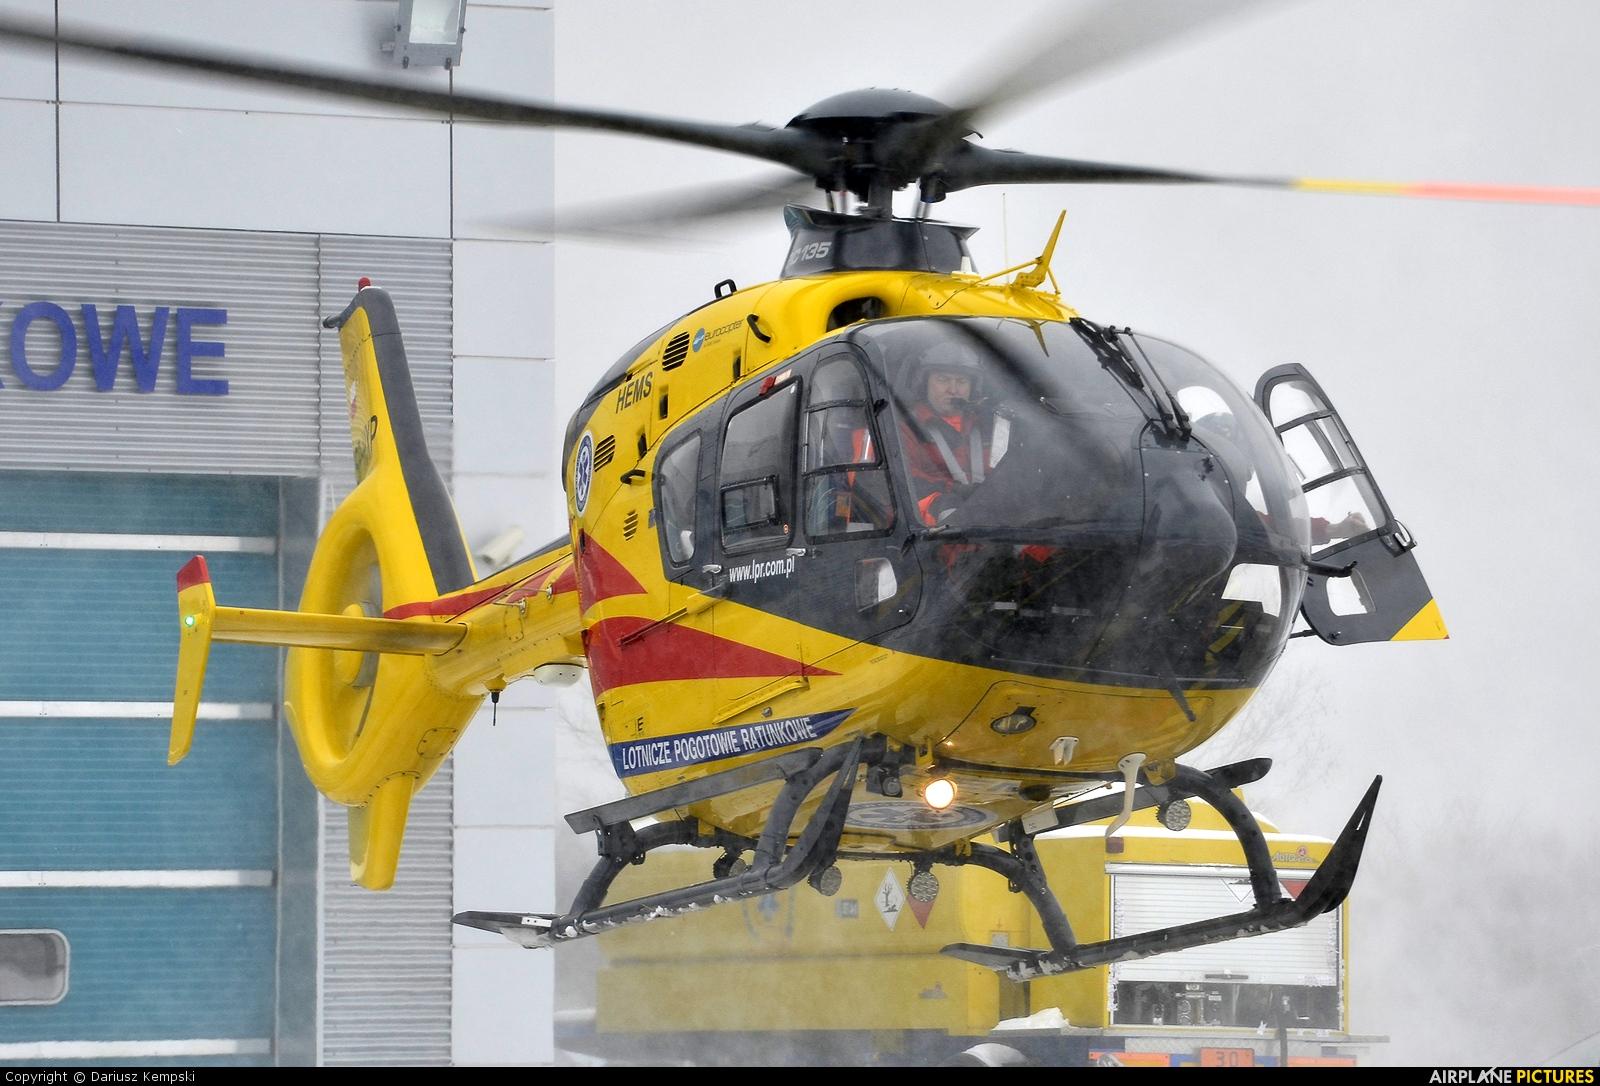 Polish Medical Air Rescue - Lotnicze Pogotowie Ratunkowe SP-HXP aircraft at Łódź - Lublinek